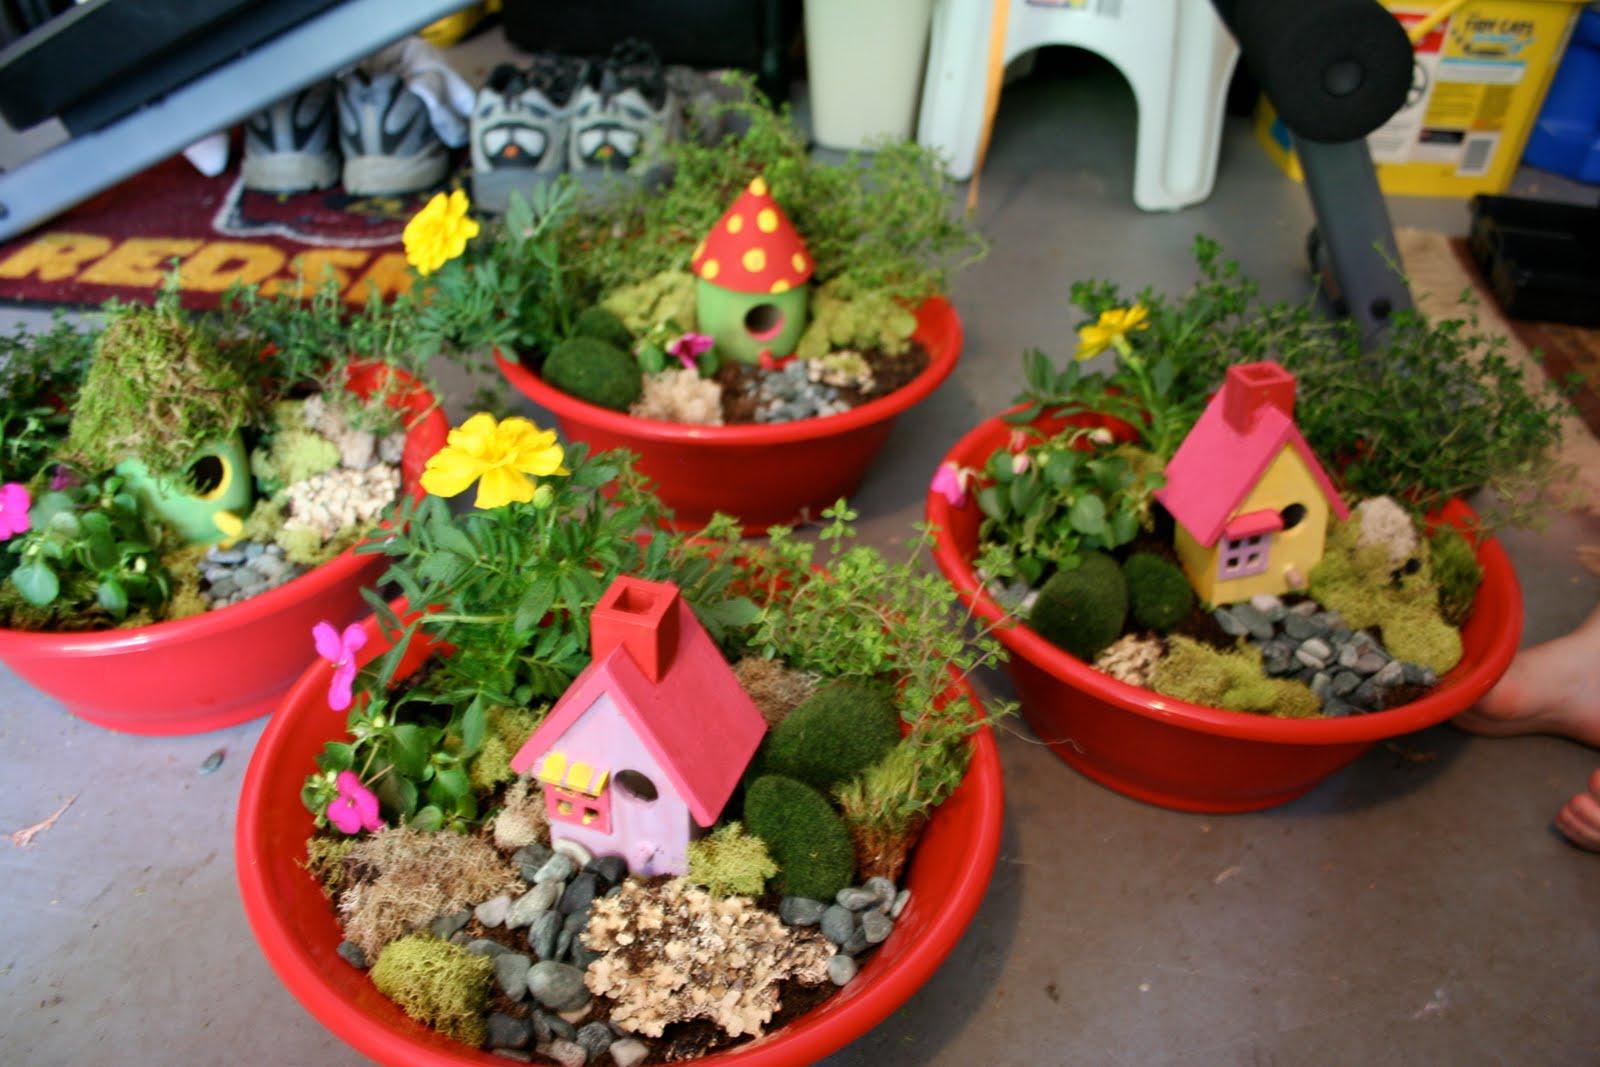 Christmas Adirondack Carousel Upcoming Events Fairy Gardens At Carousel Kids Fairy Garden Kit garden Kids Fairy Garden Kit